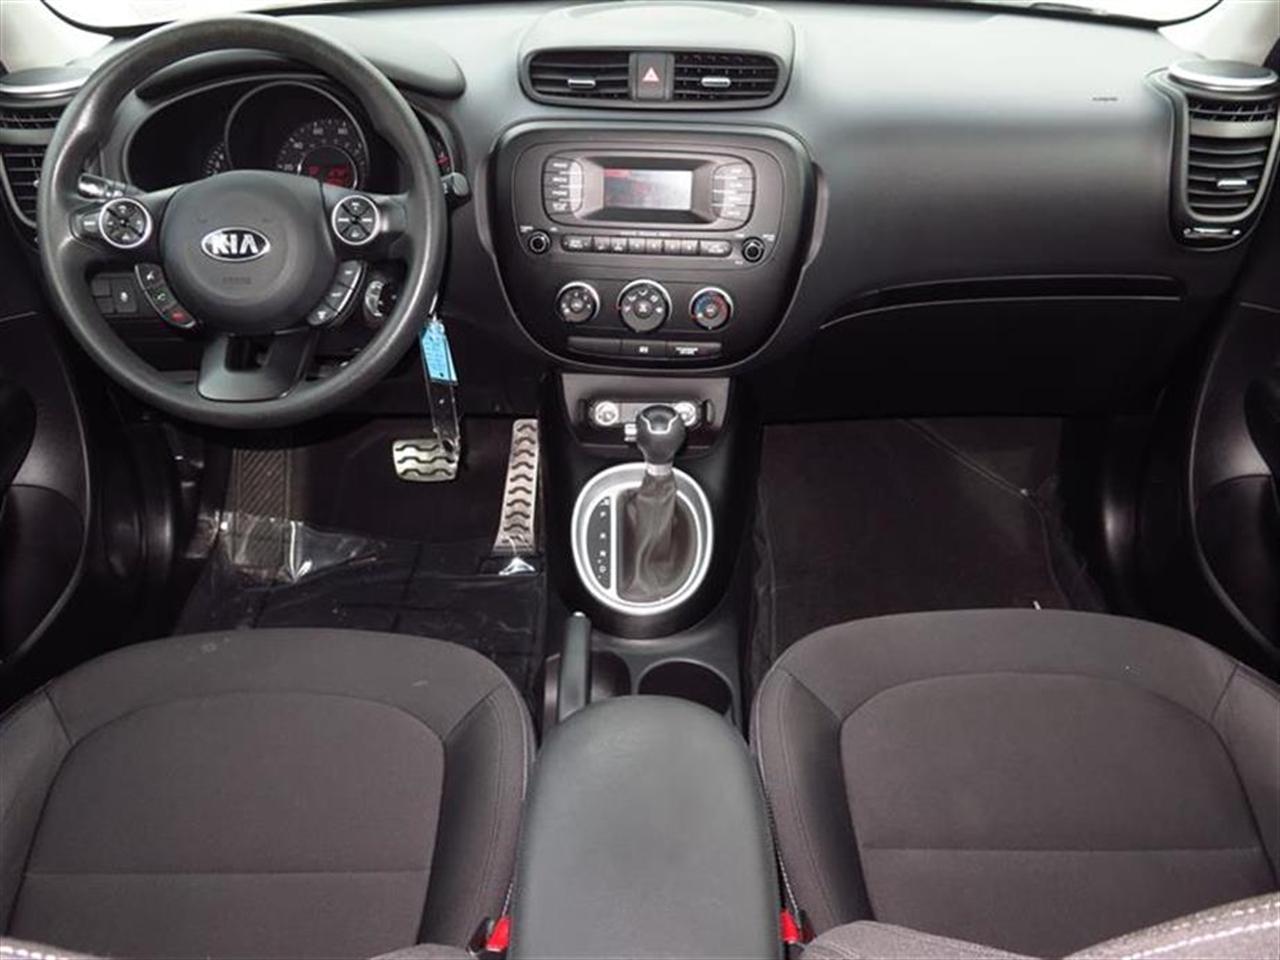 2014 KIA SOUL 5dr Wgn Auto Base 26261 miles 2 12V DC Power Outlets 4-Way Passenger Seat -inc M